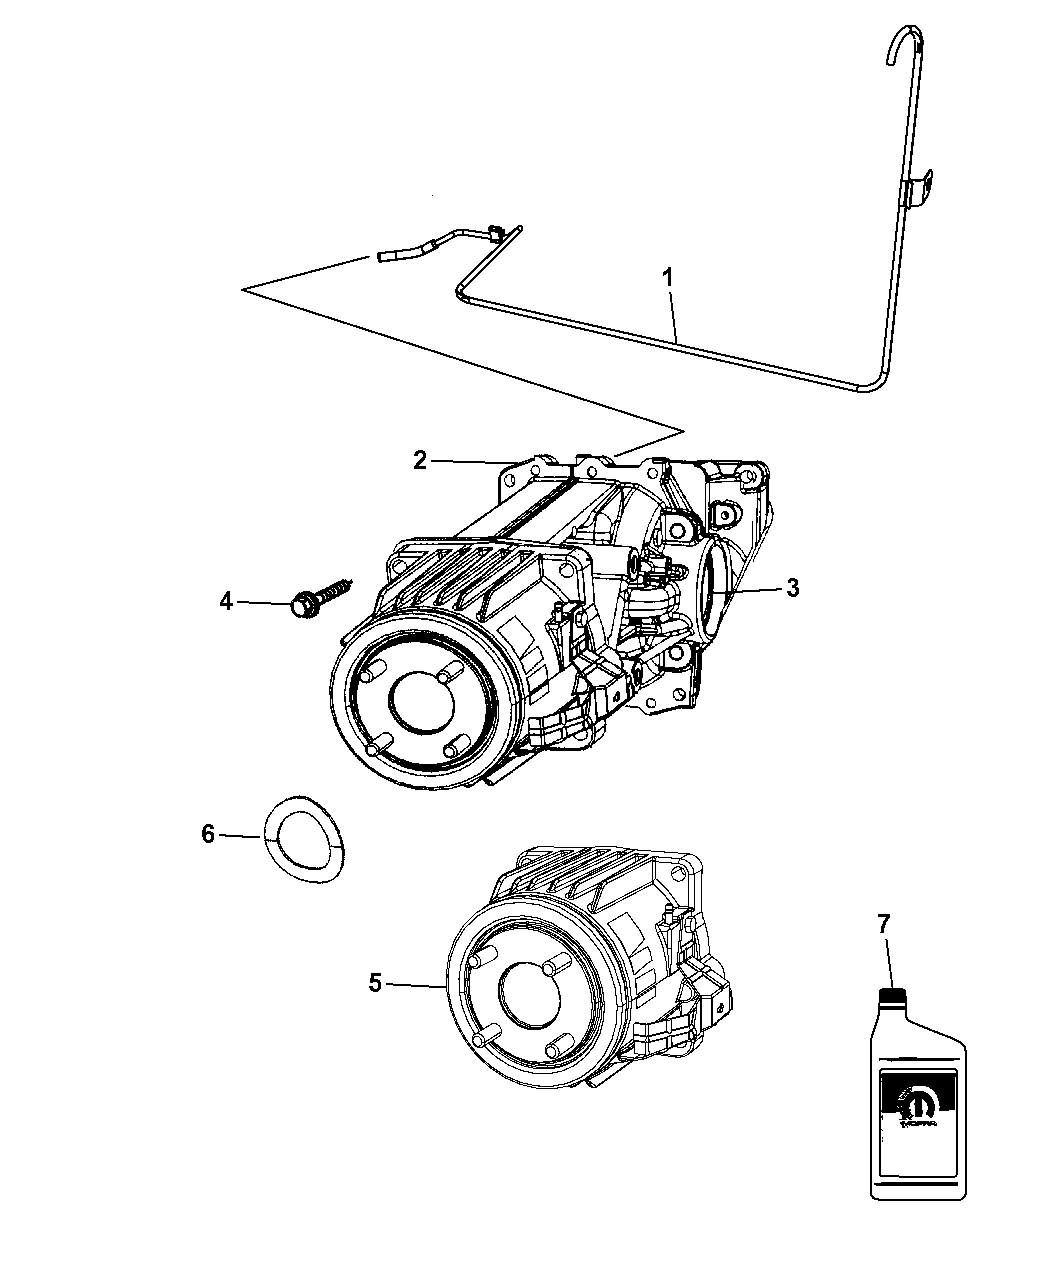 Jeep Patriot Rear Axle Assembly